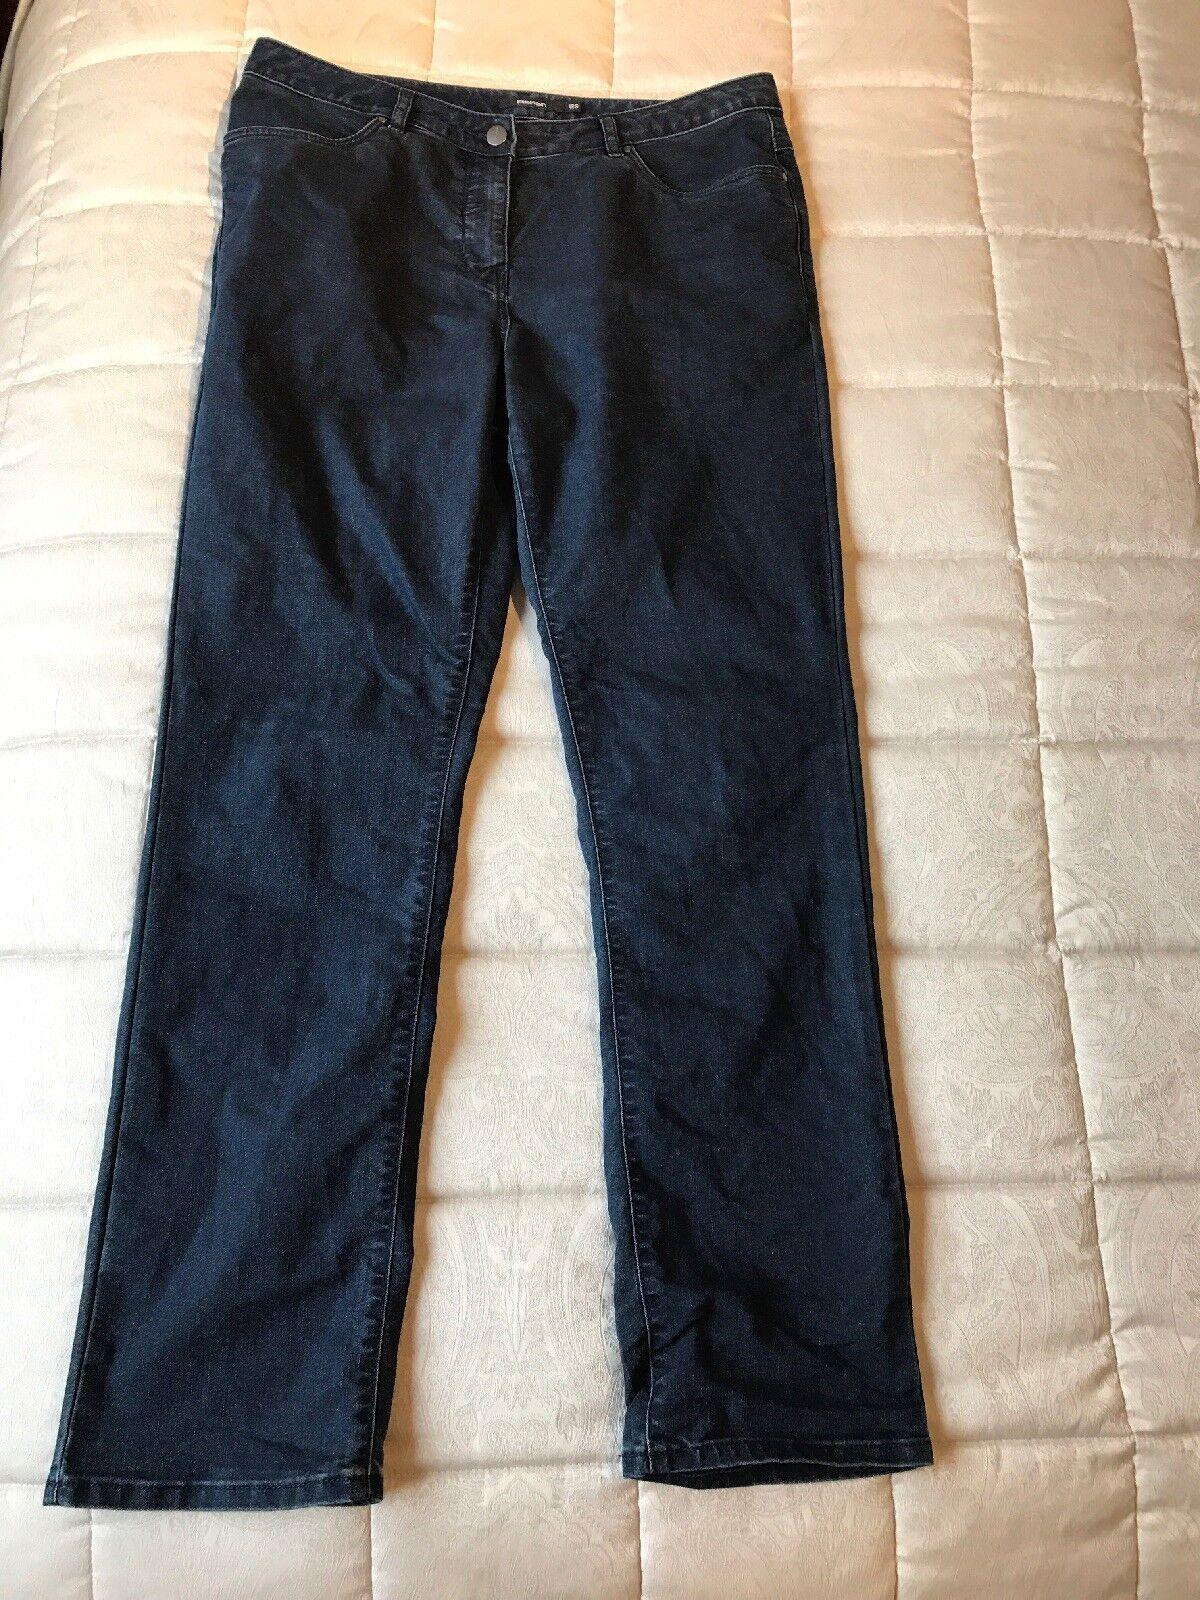 Rohan Ladies Jeans Plus (straight Leg) Size 12R